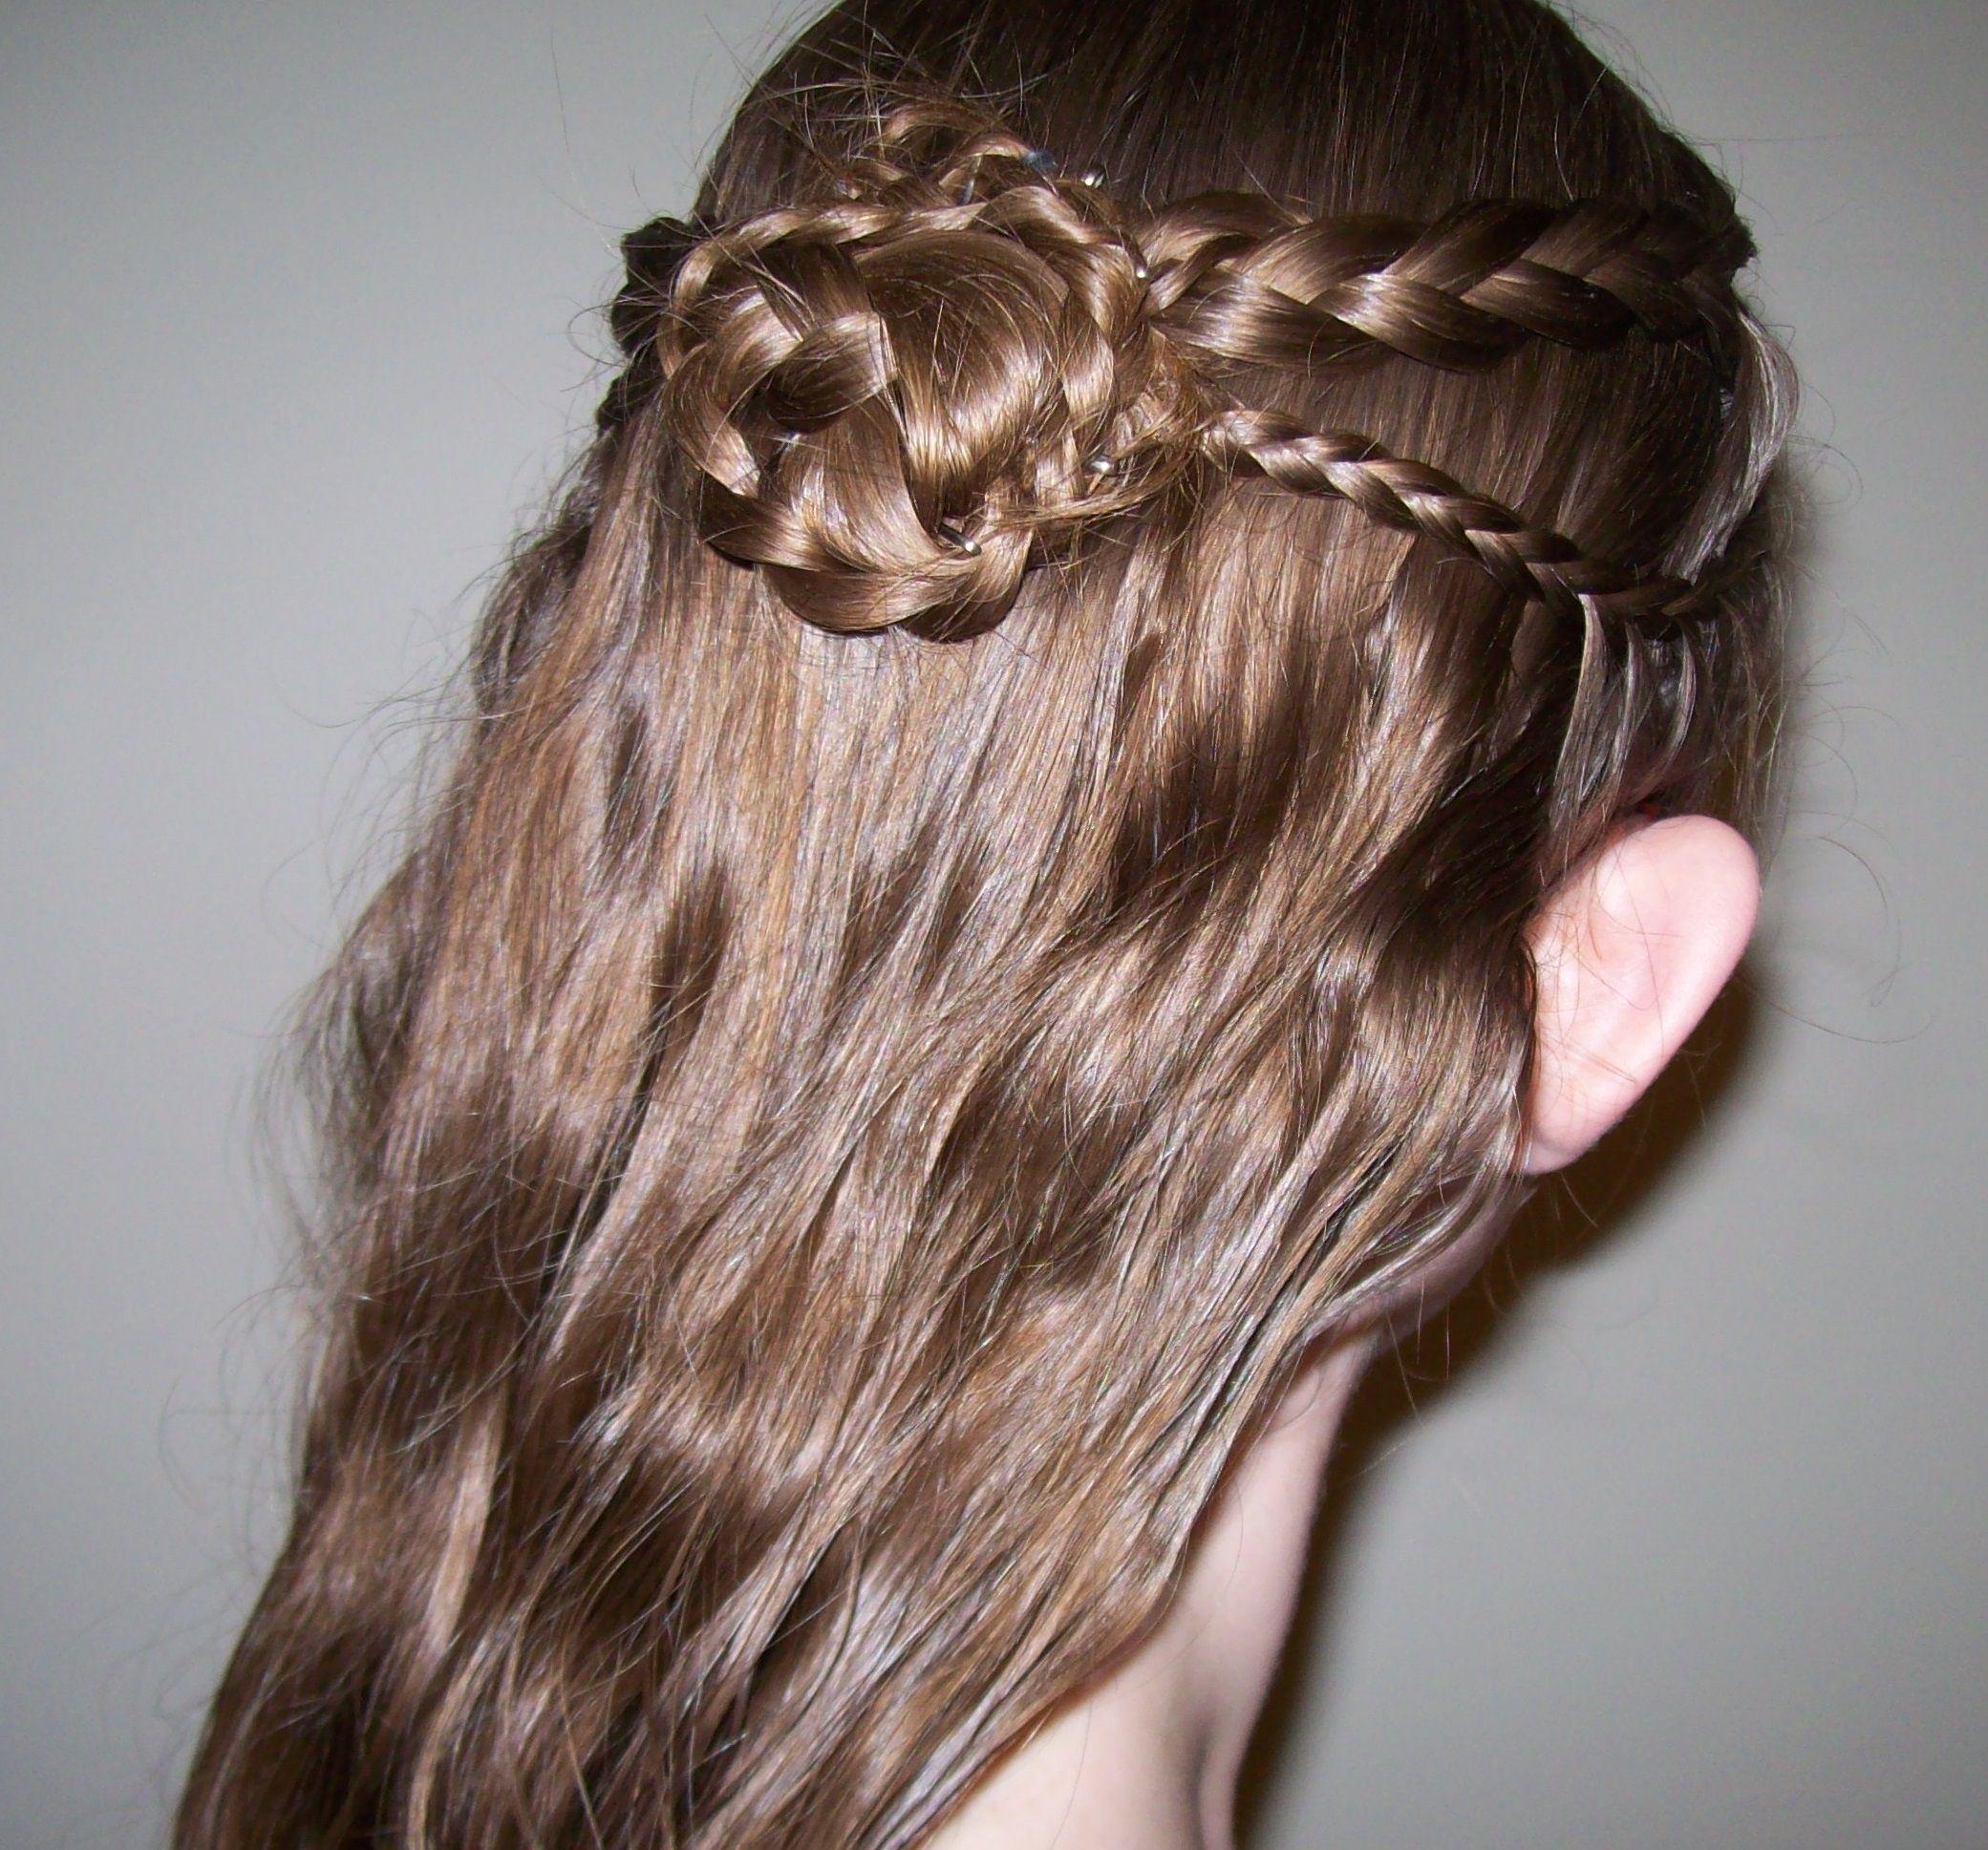 elvish inspired half-up hairstyle with braid rosette